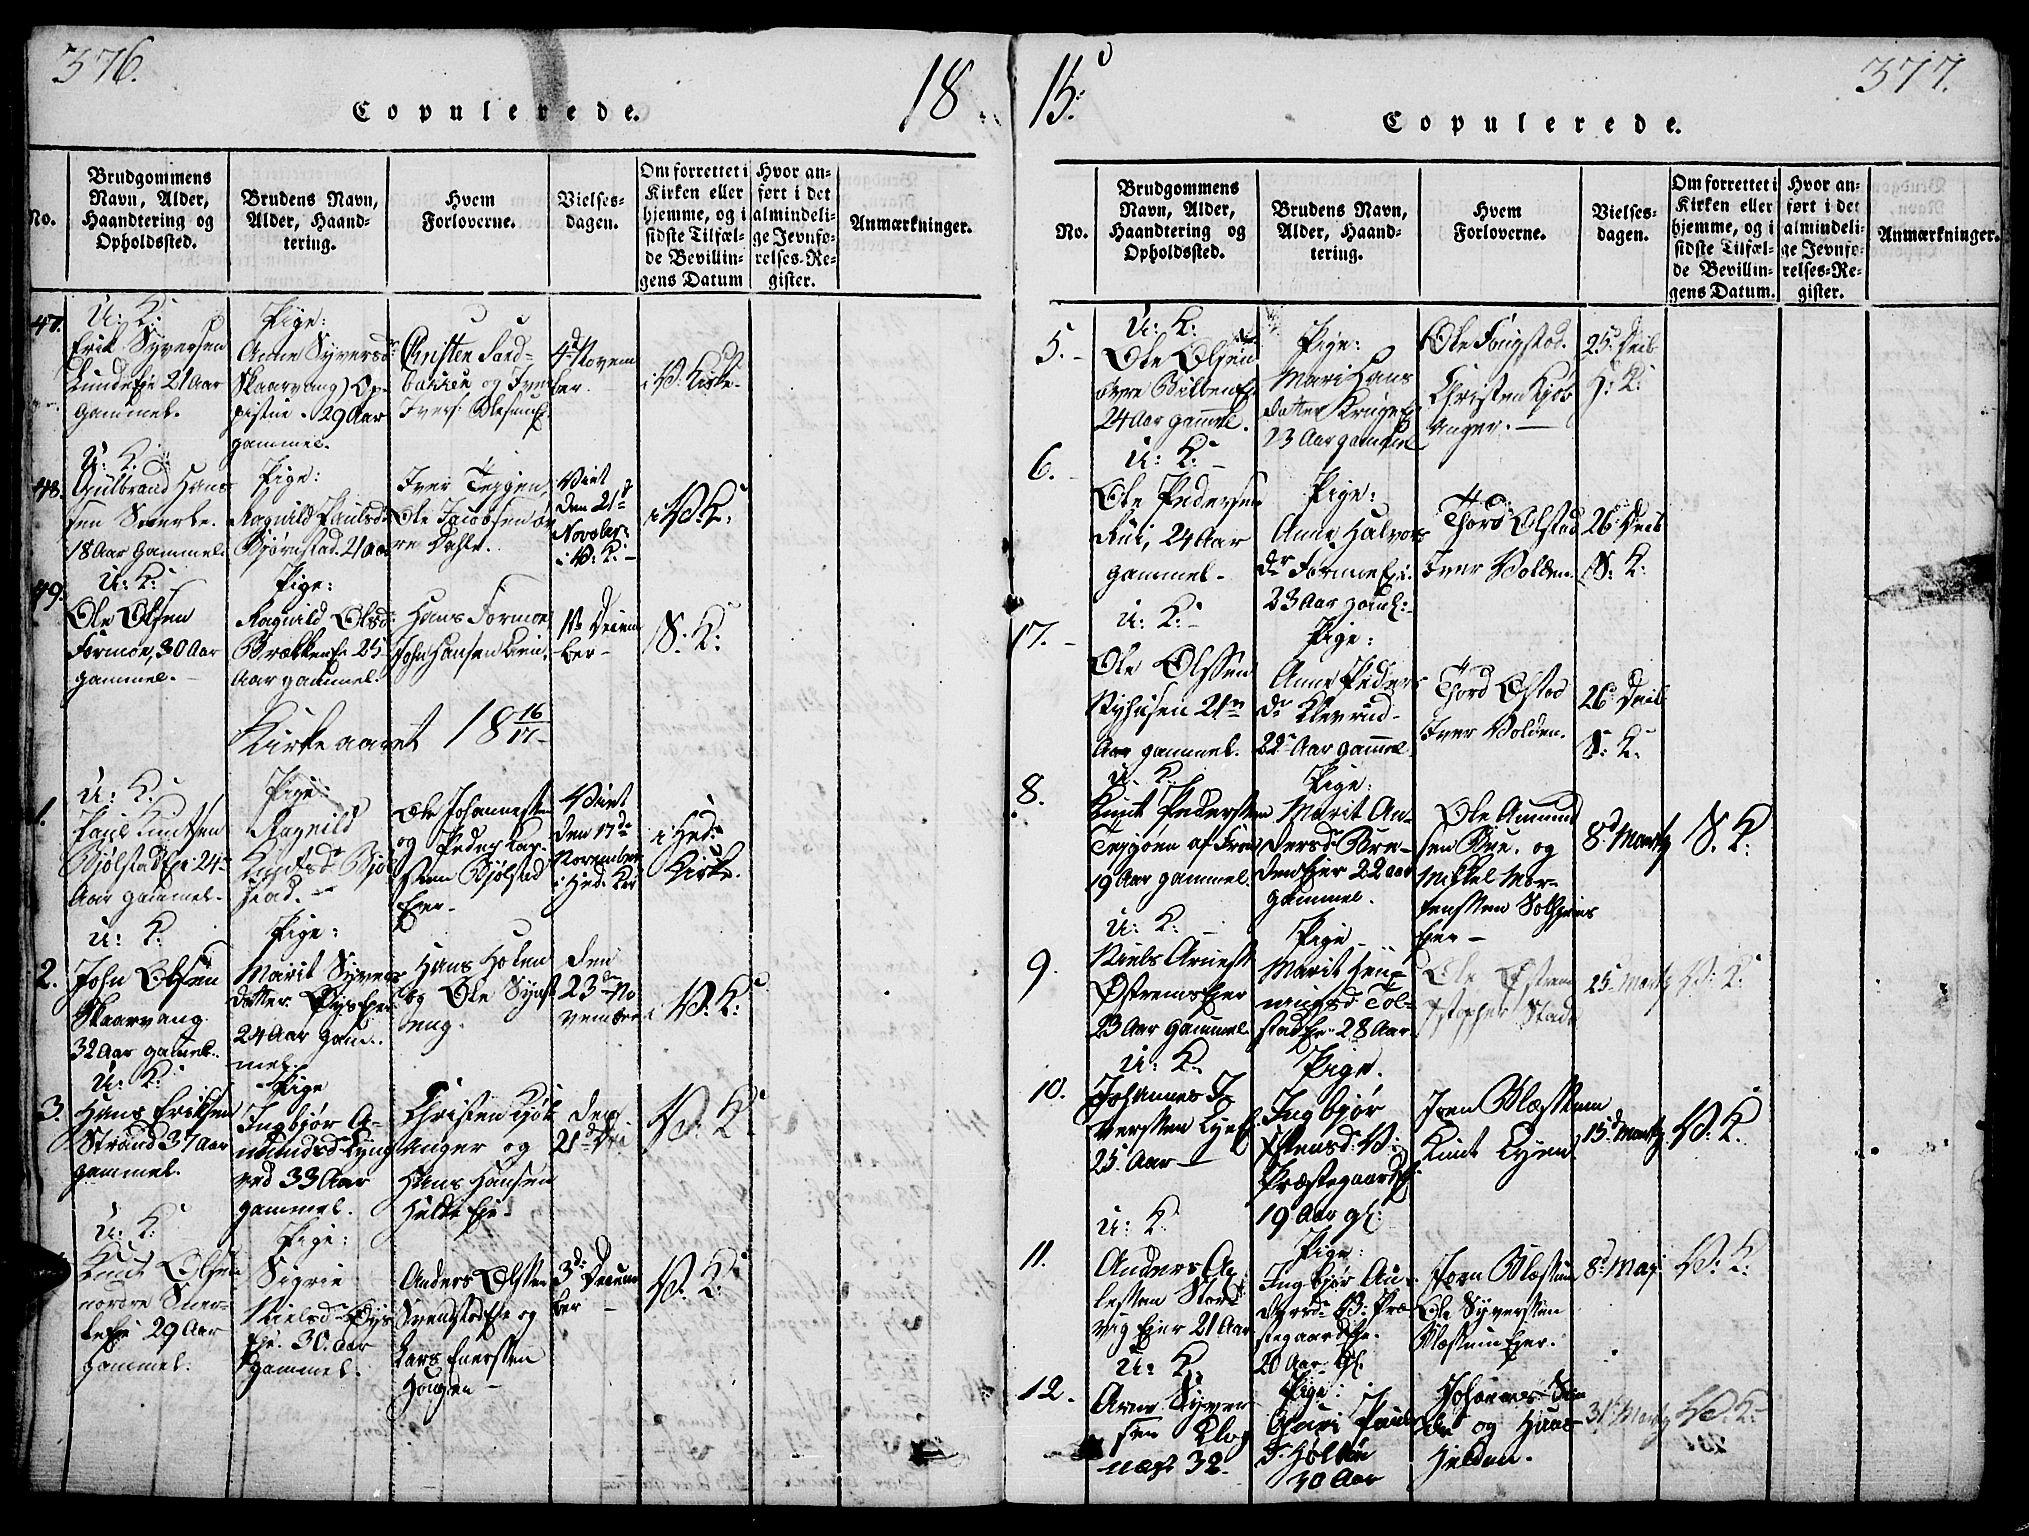 SAH, Vågå prestekontor, Ministerialbok nr. 3, 1815-1827, s. 376-377